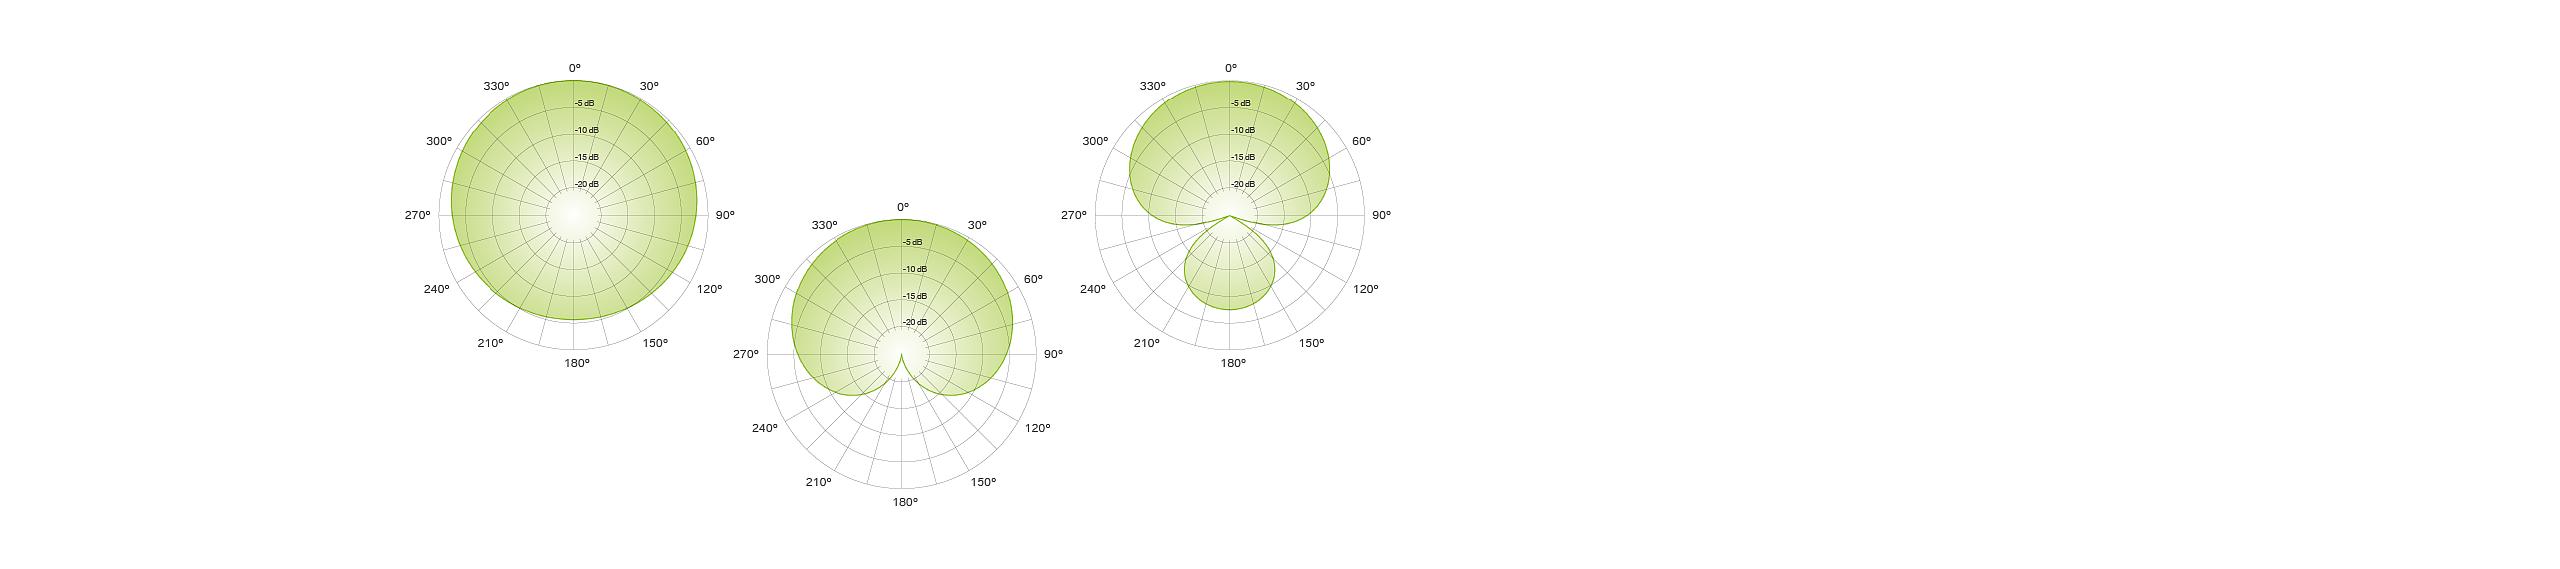 MTP 940 polar patterns